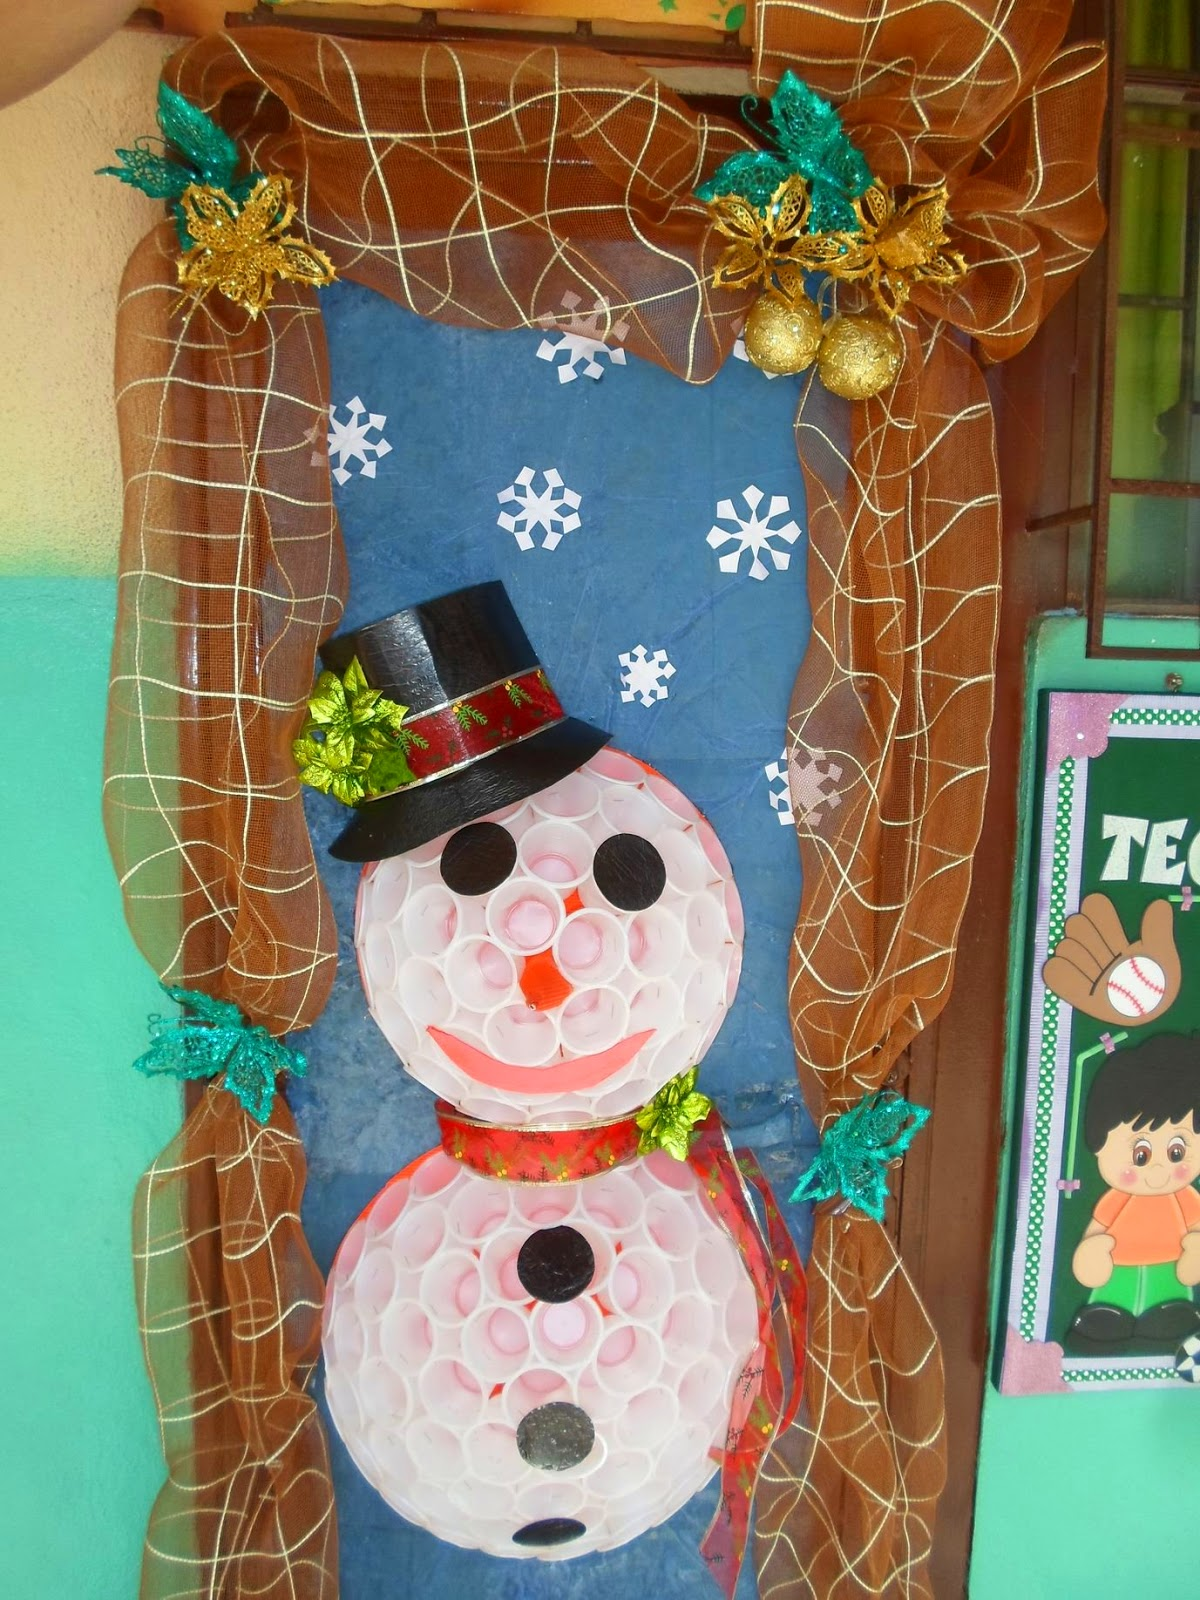 Talento deportivo bolivar for Puertas decoradas navidad material reciclable